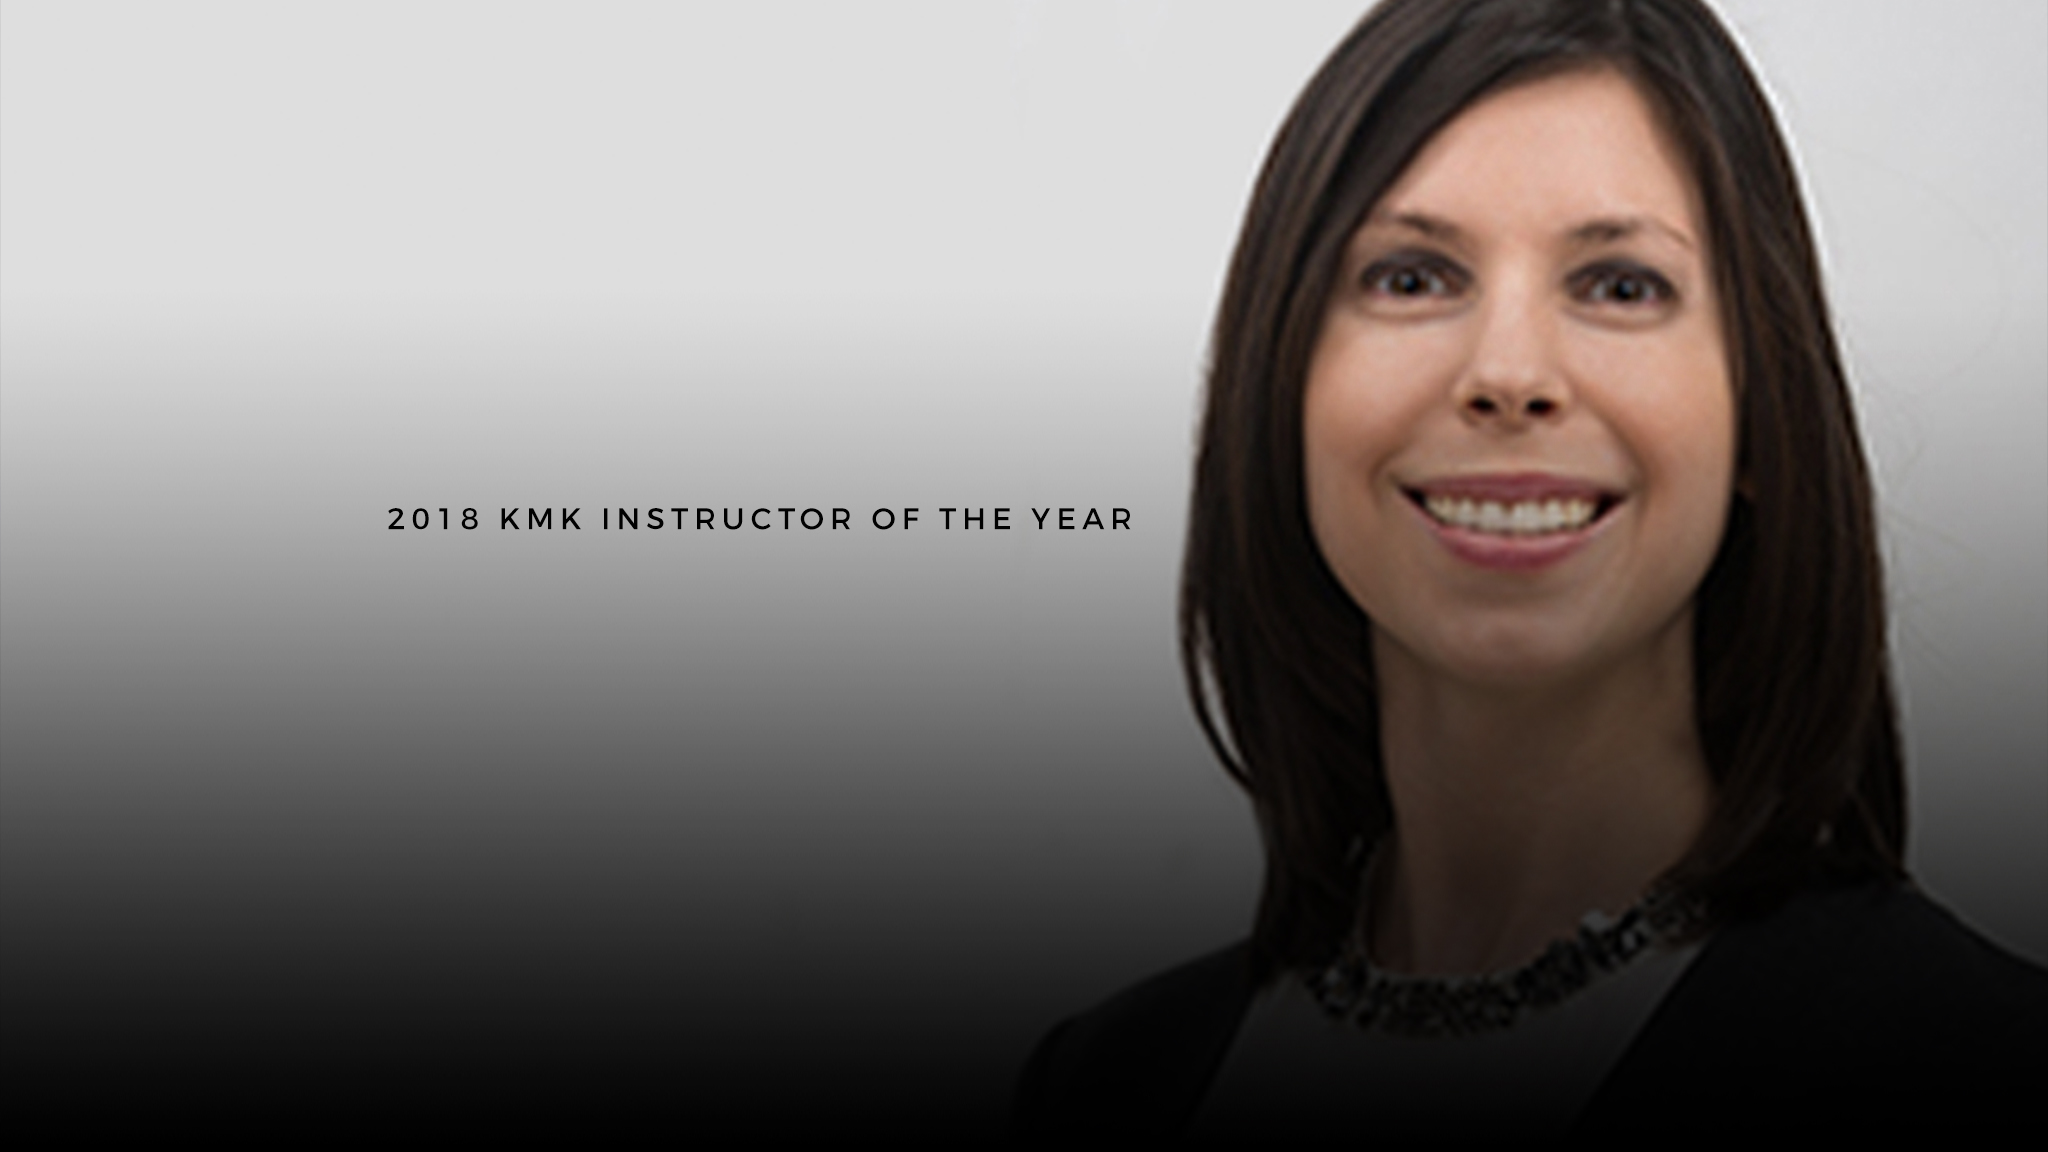 Dr. Maria Pribis